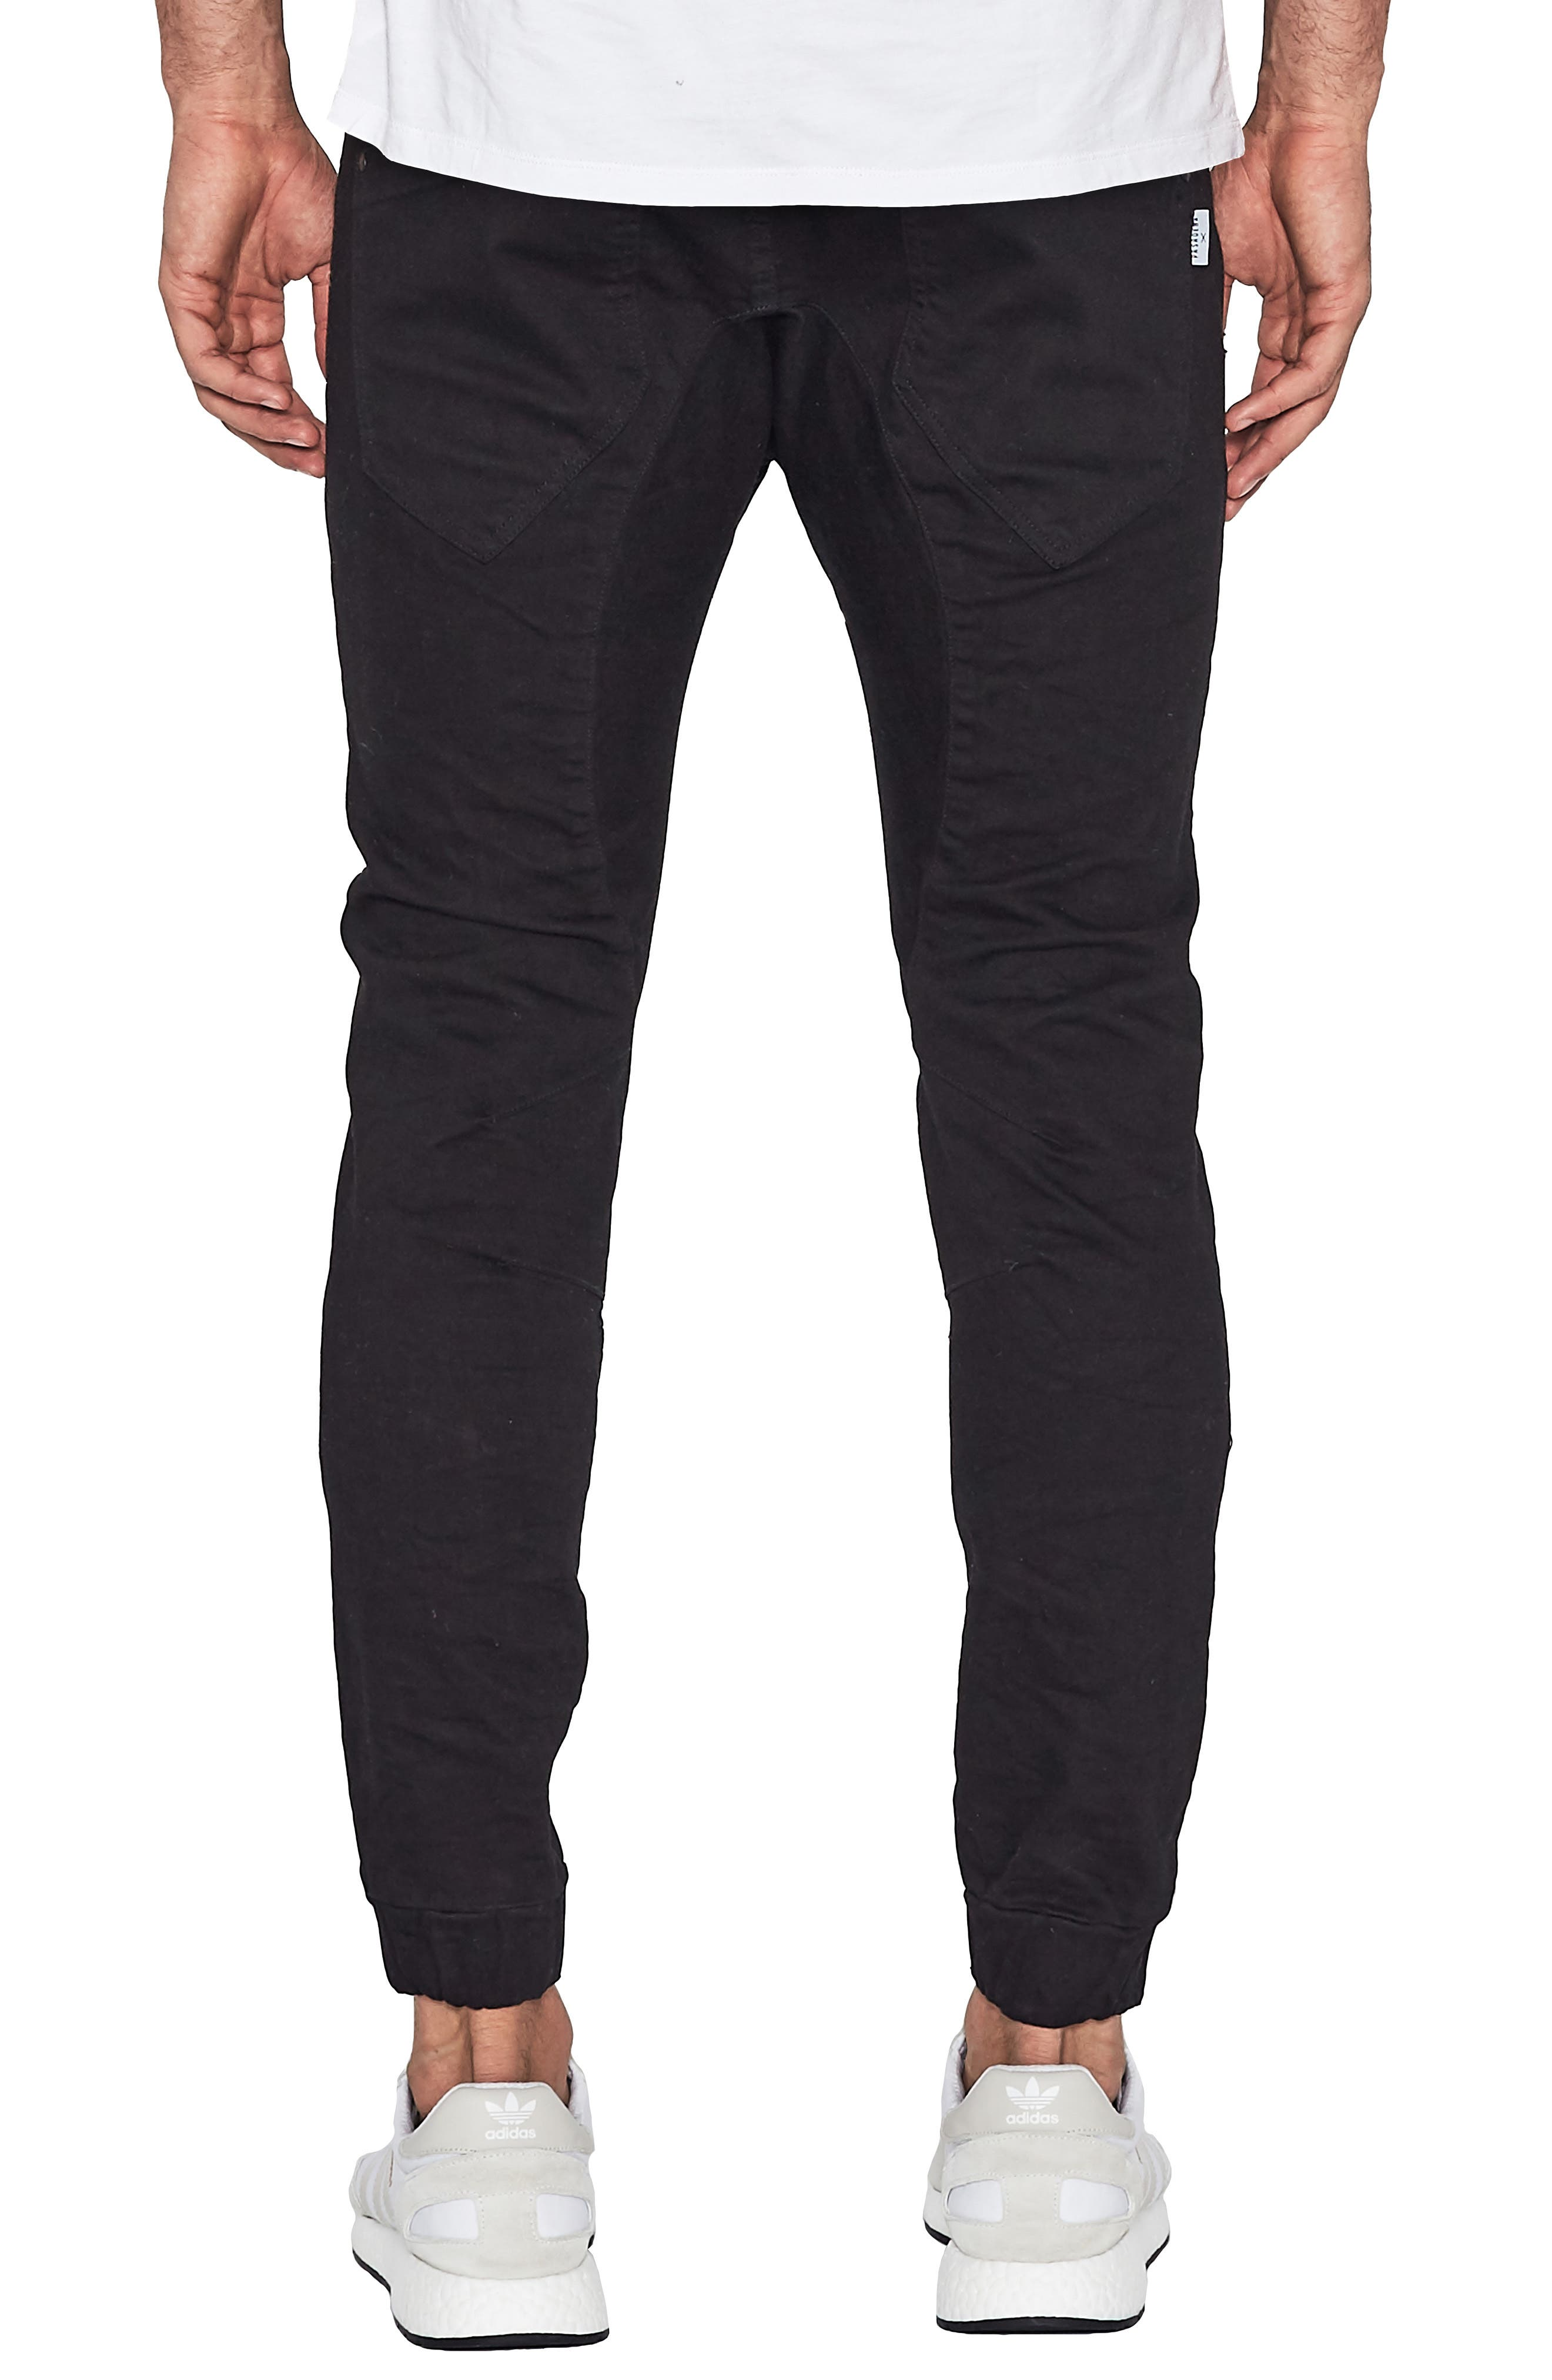 Hellcat Slim Fit Pants,                             Alternate thumbnail 2, color,                             001